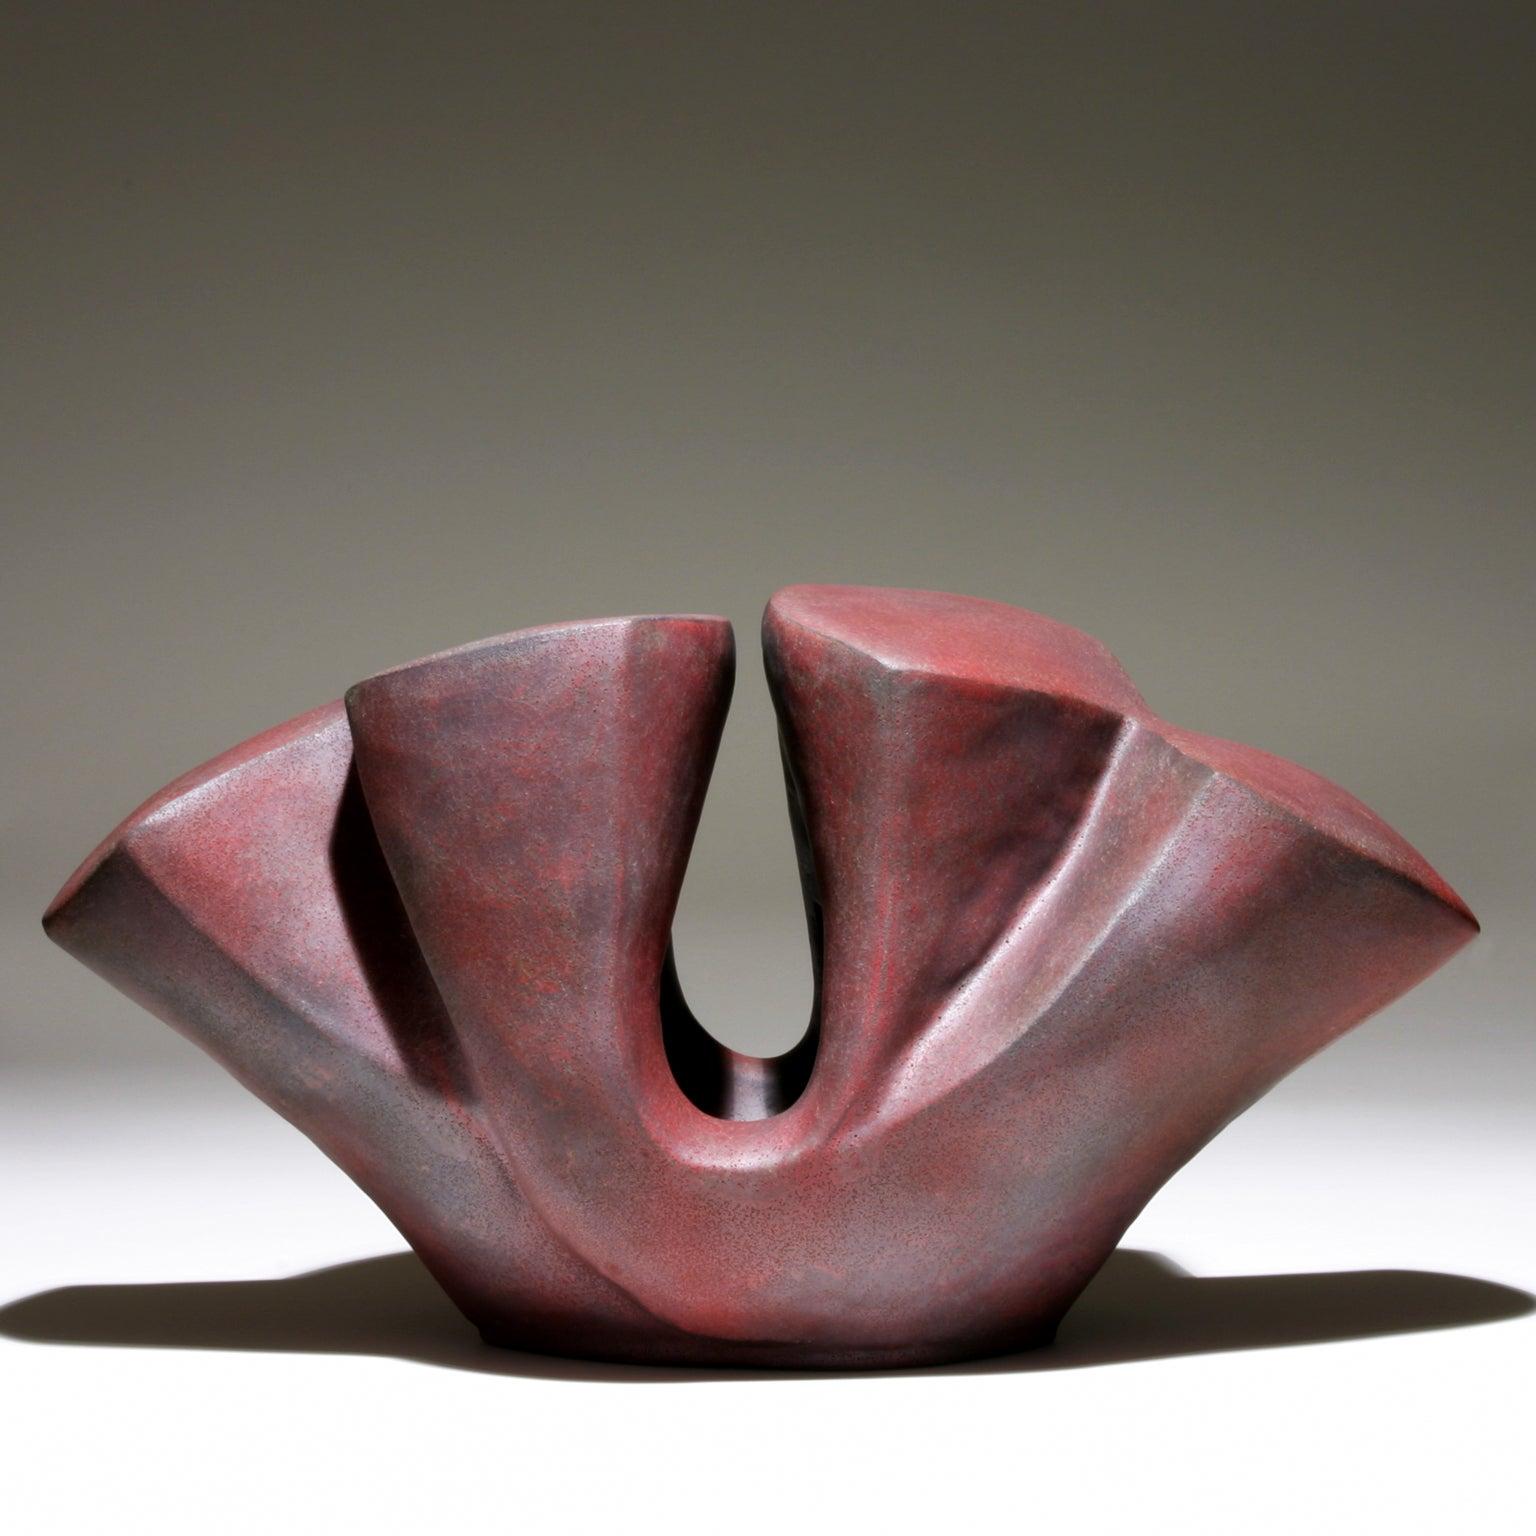 Modern Ceramic Sculpture by Jerilyn Virden